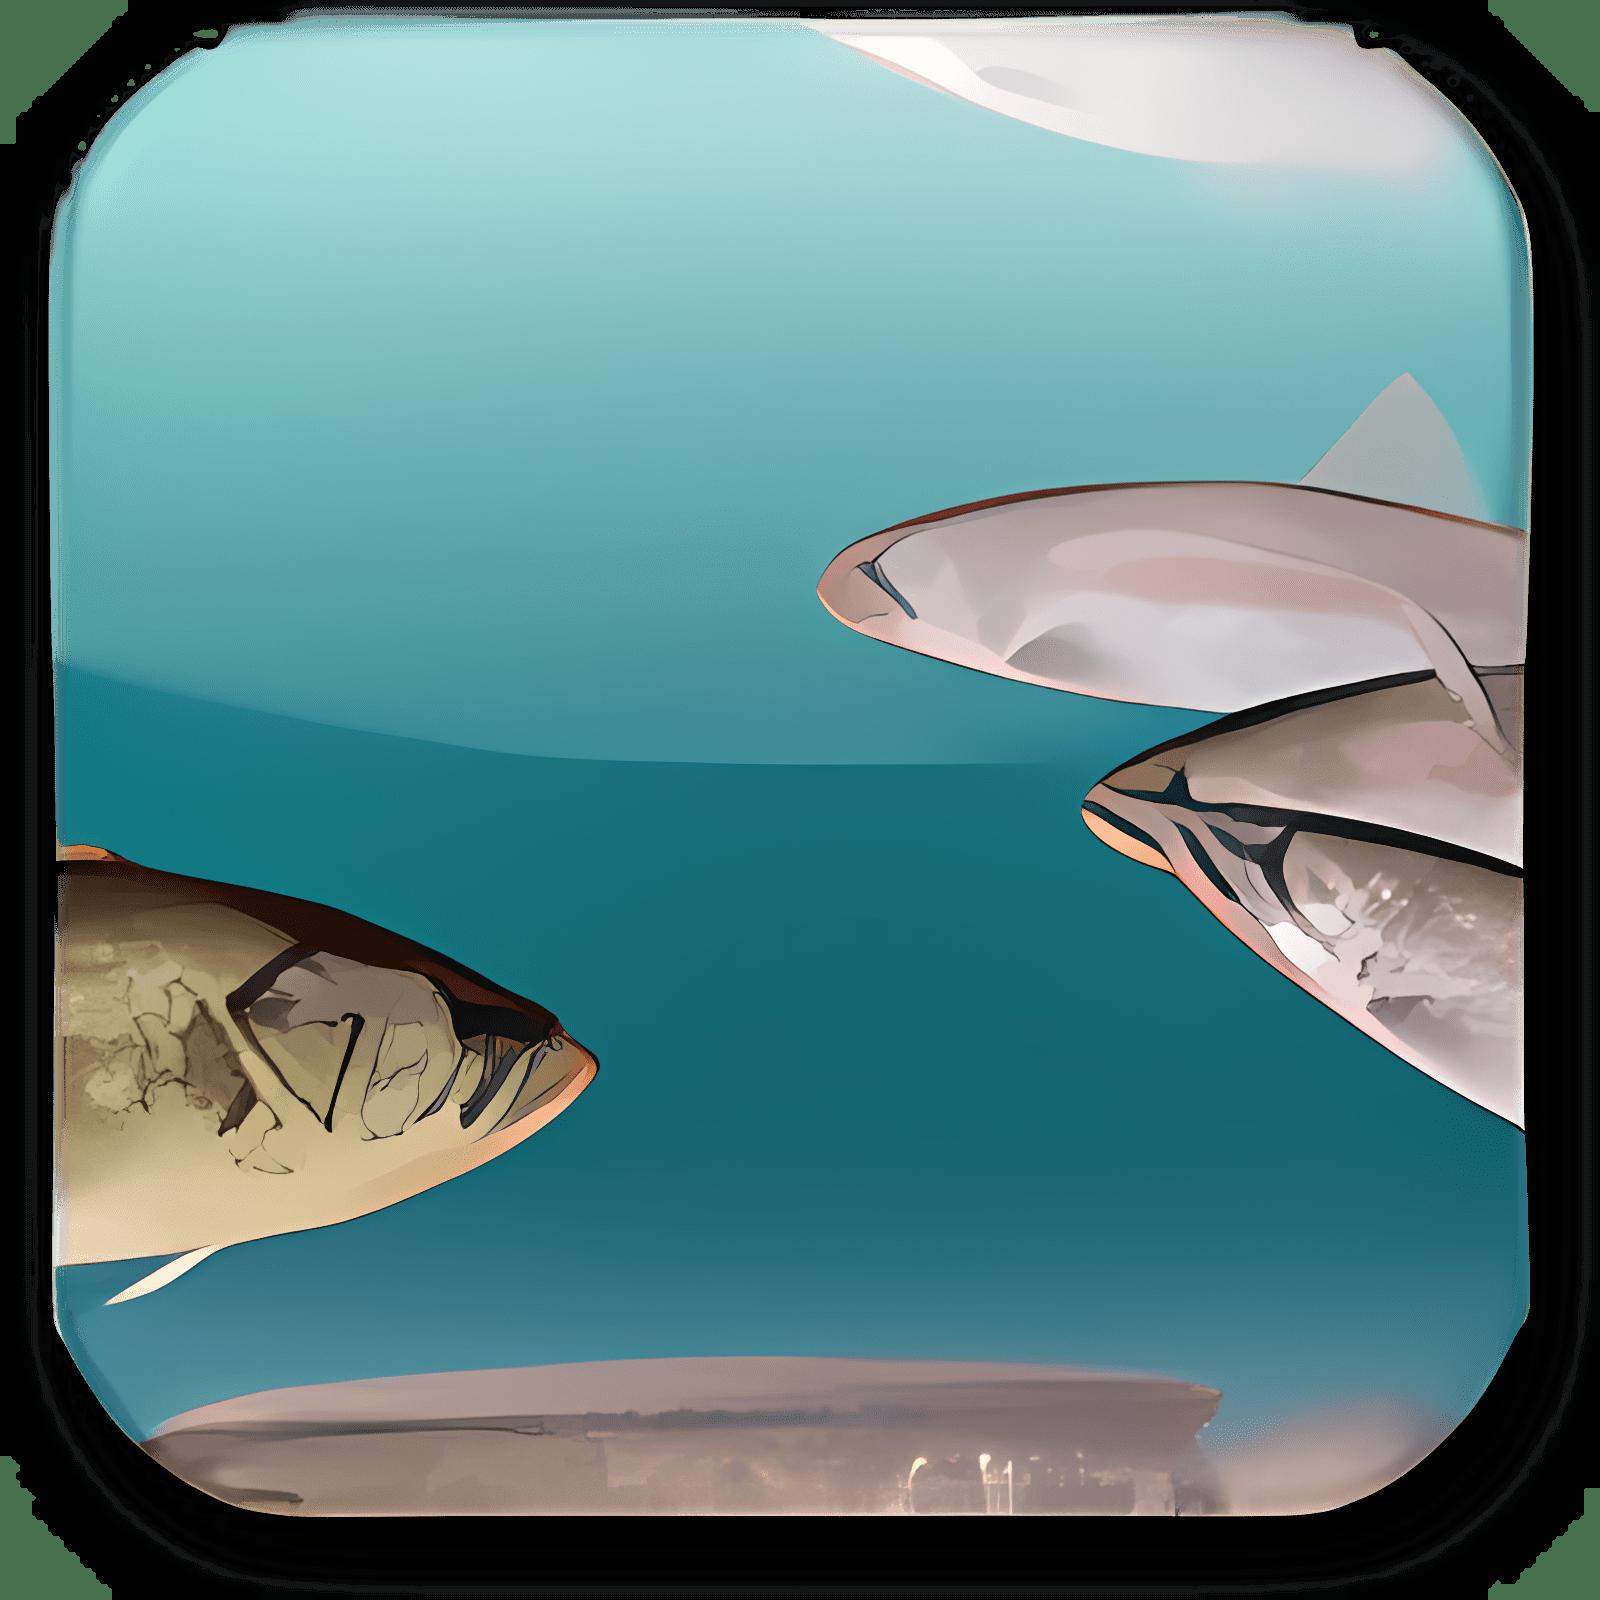 Aquazone Bass Edition 2.0